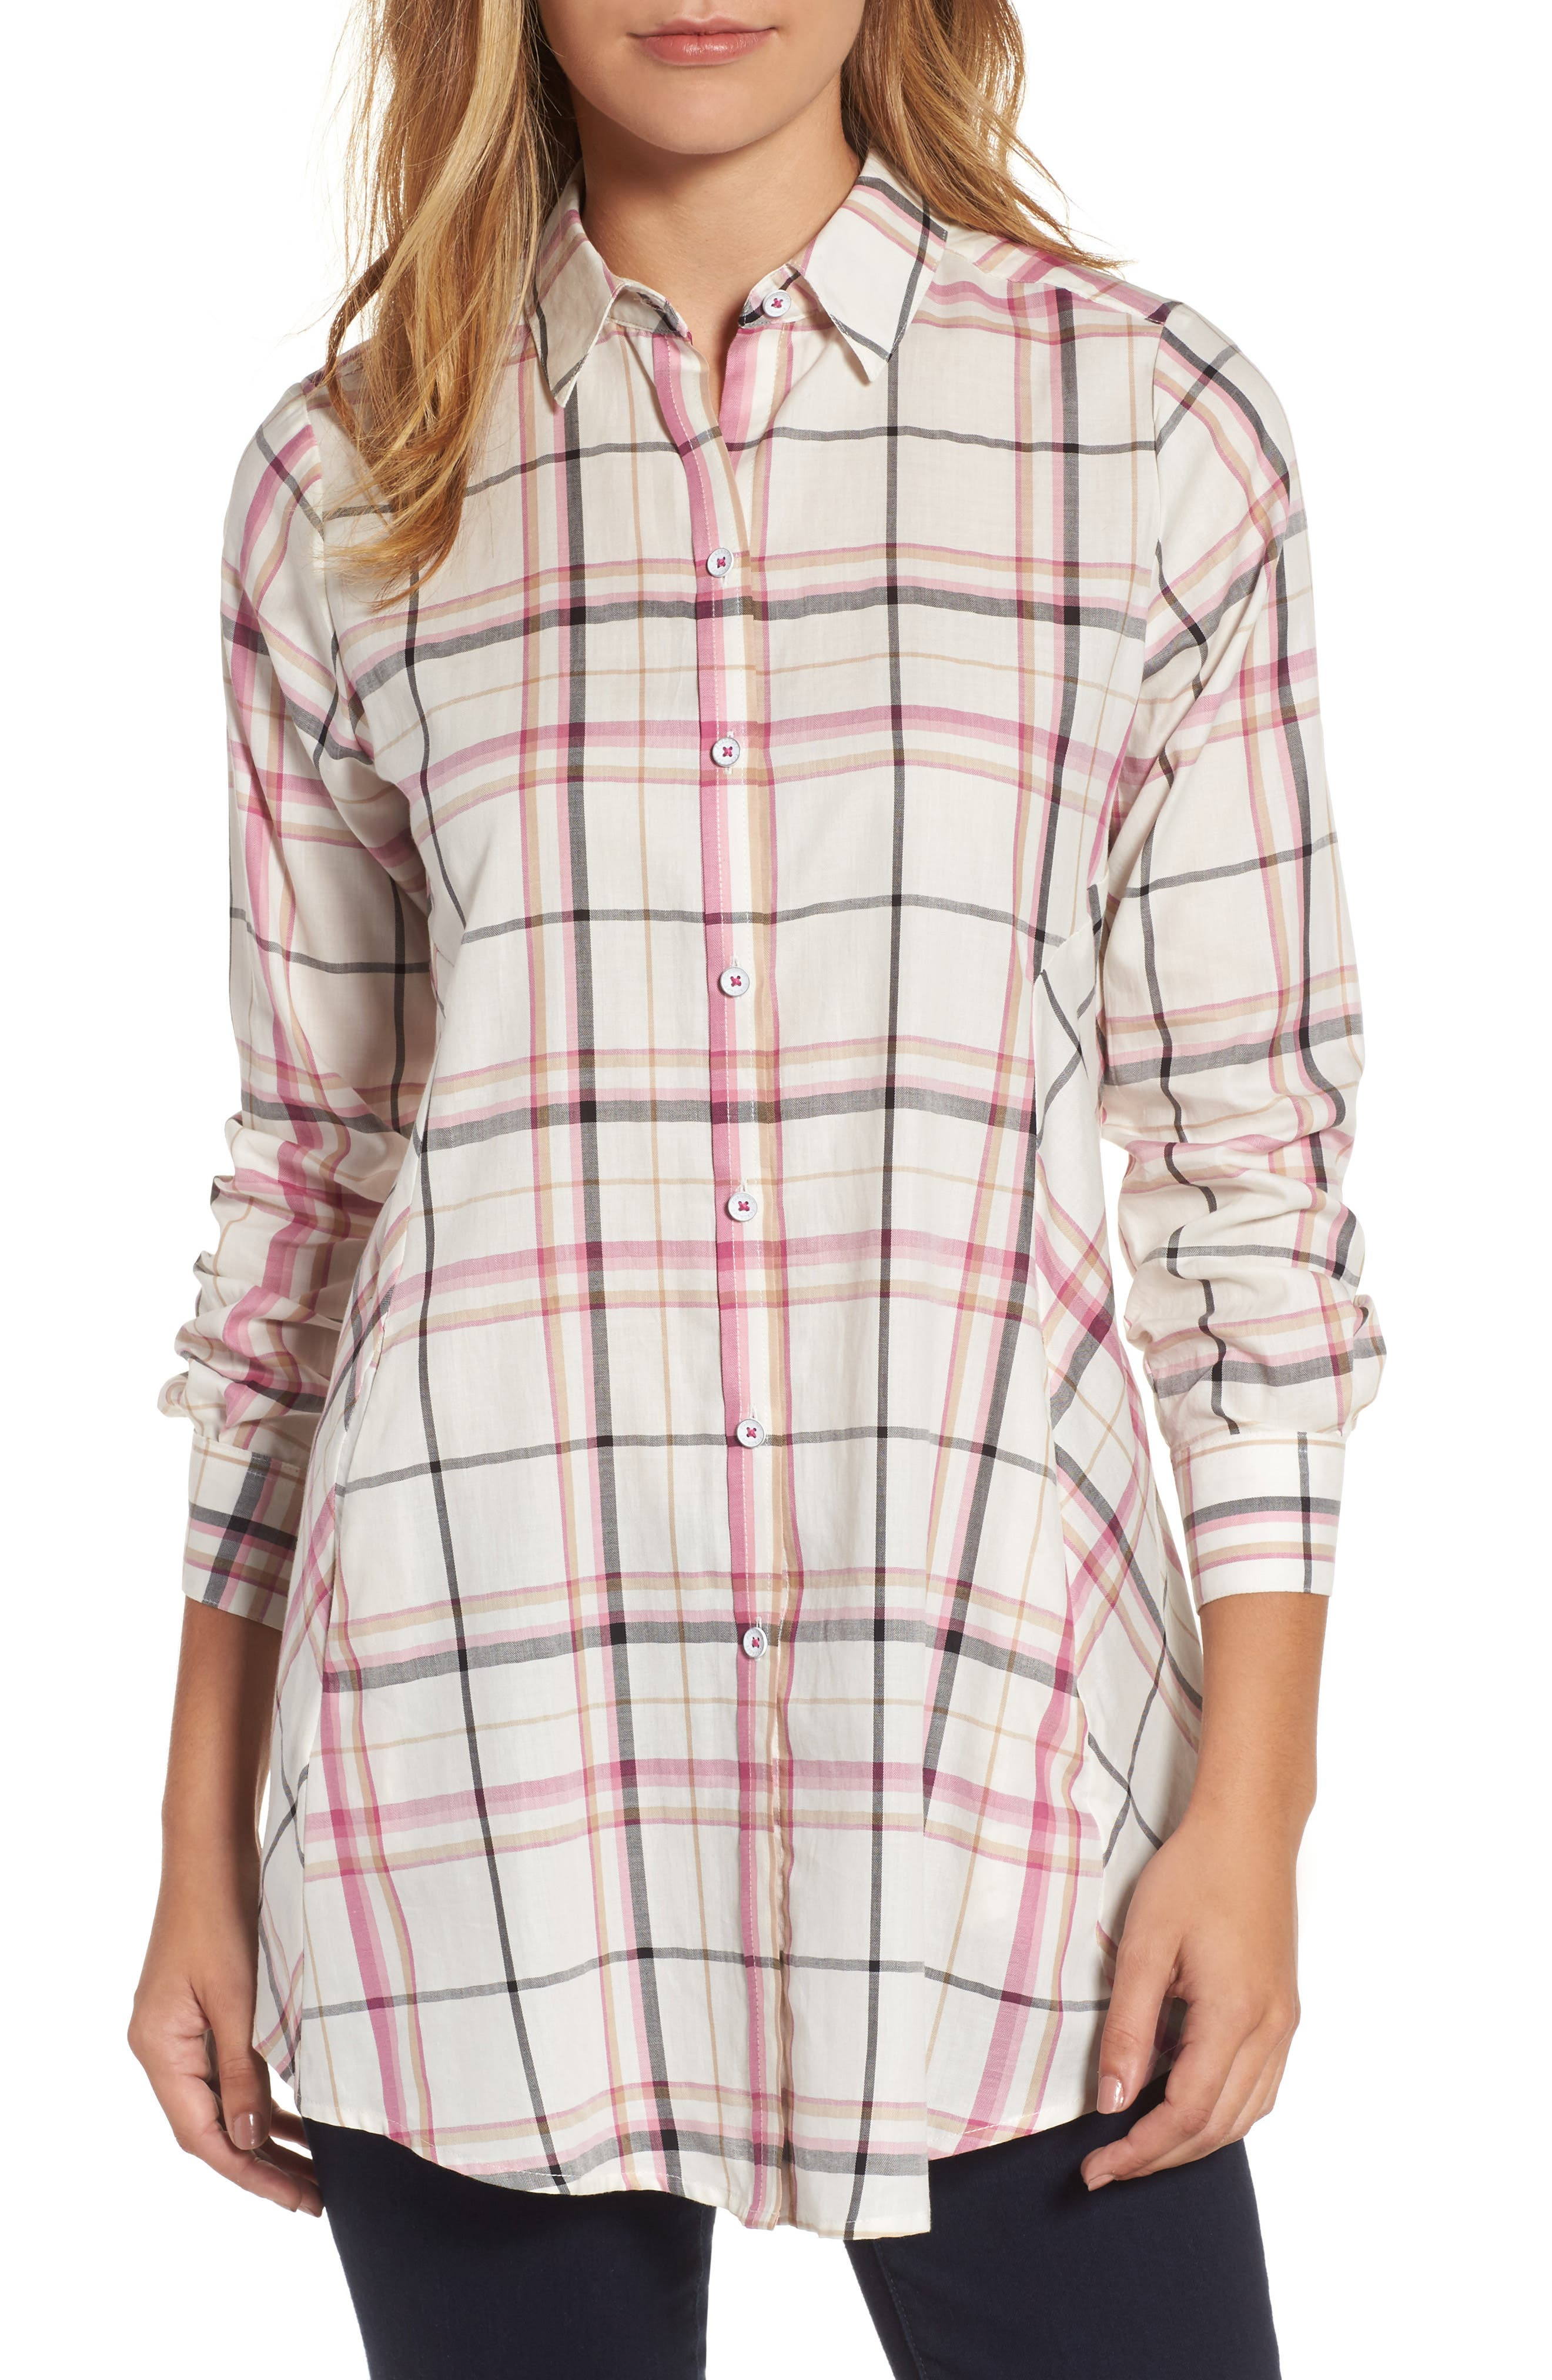 Alternate Image 1 Selected - Foxcroft Cici Plaid Shirt